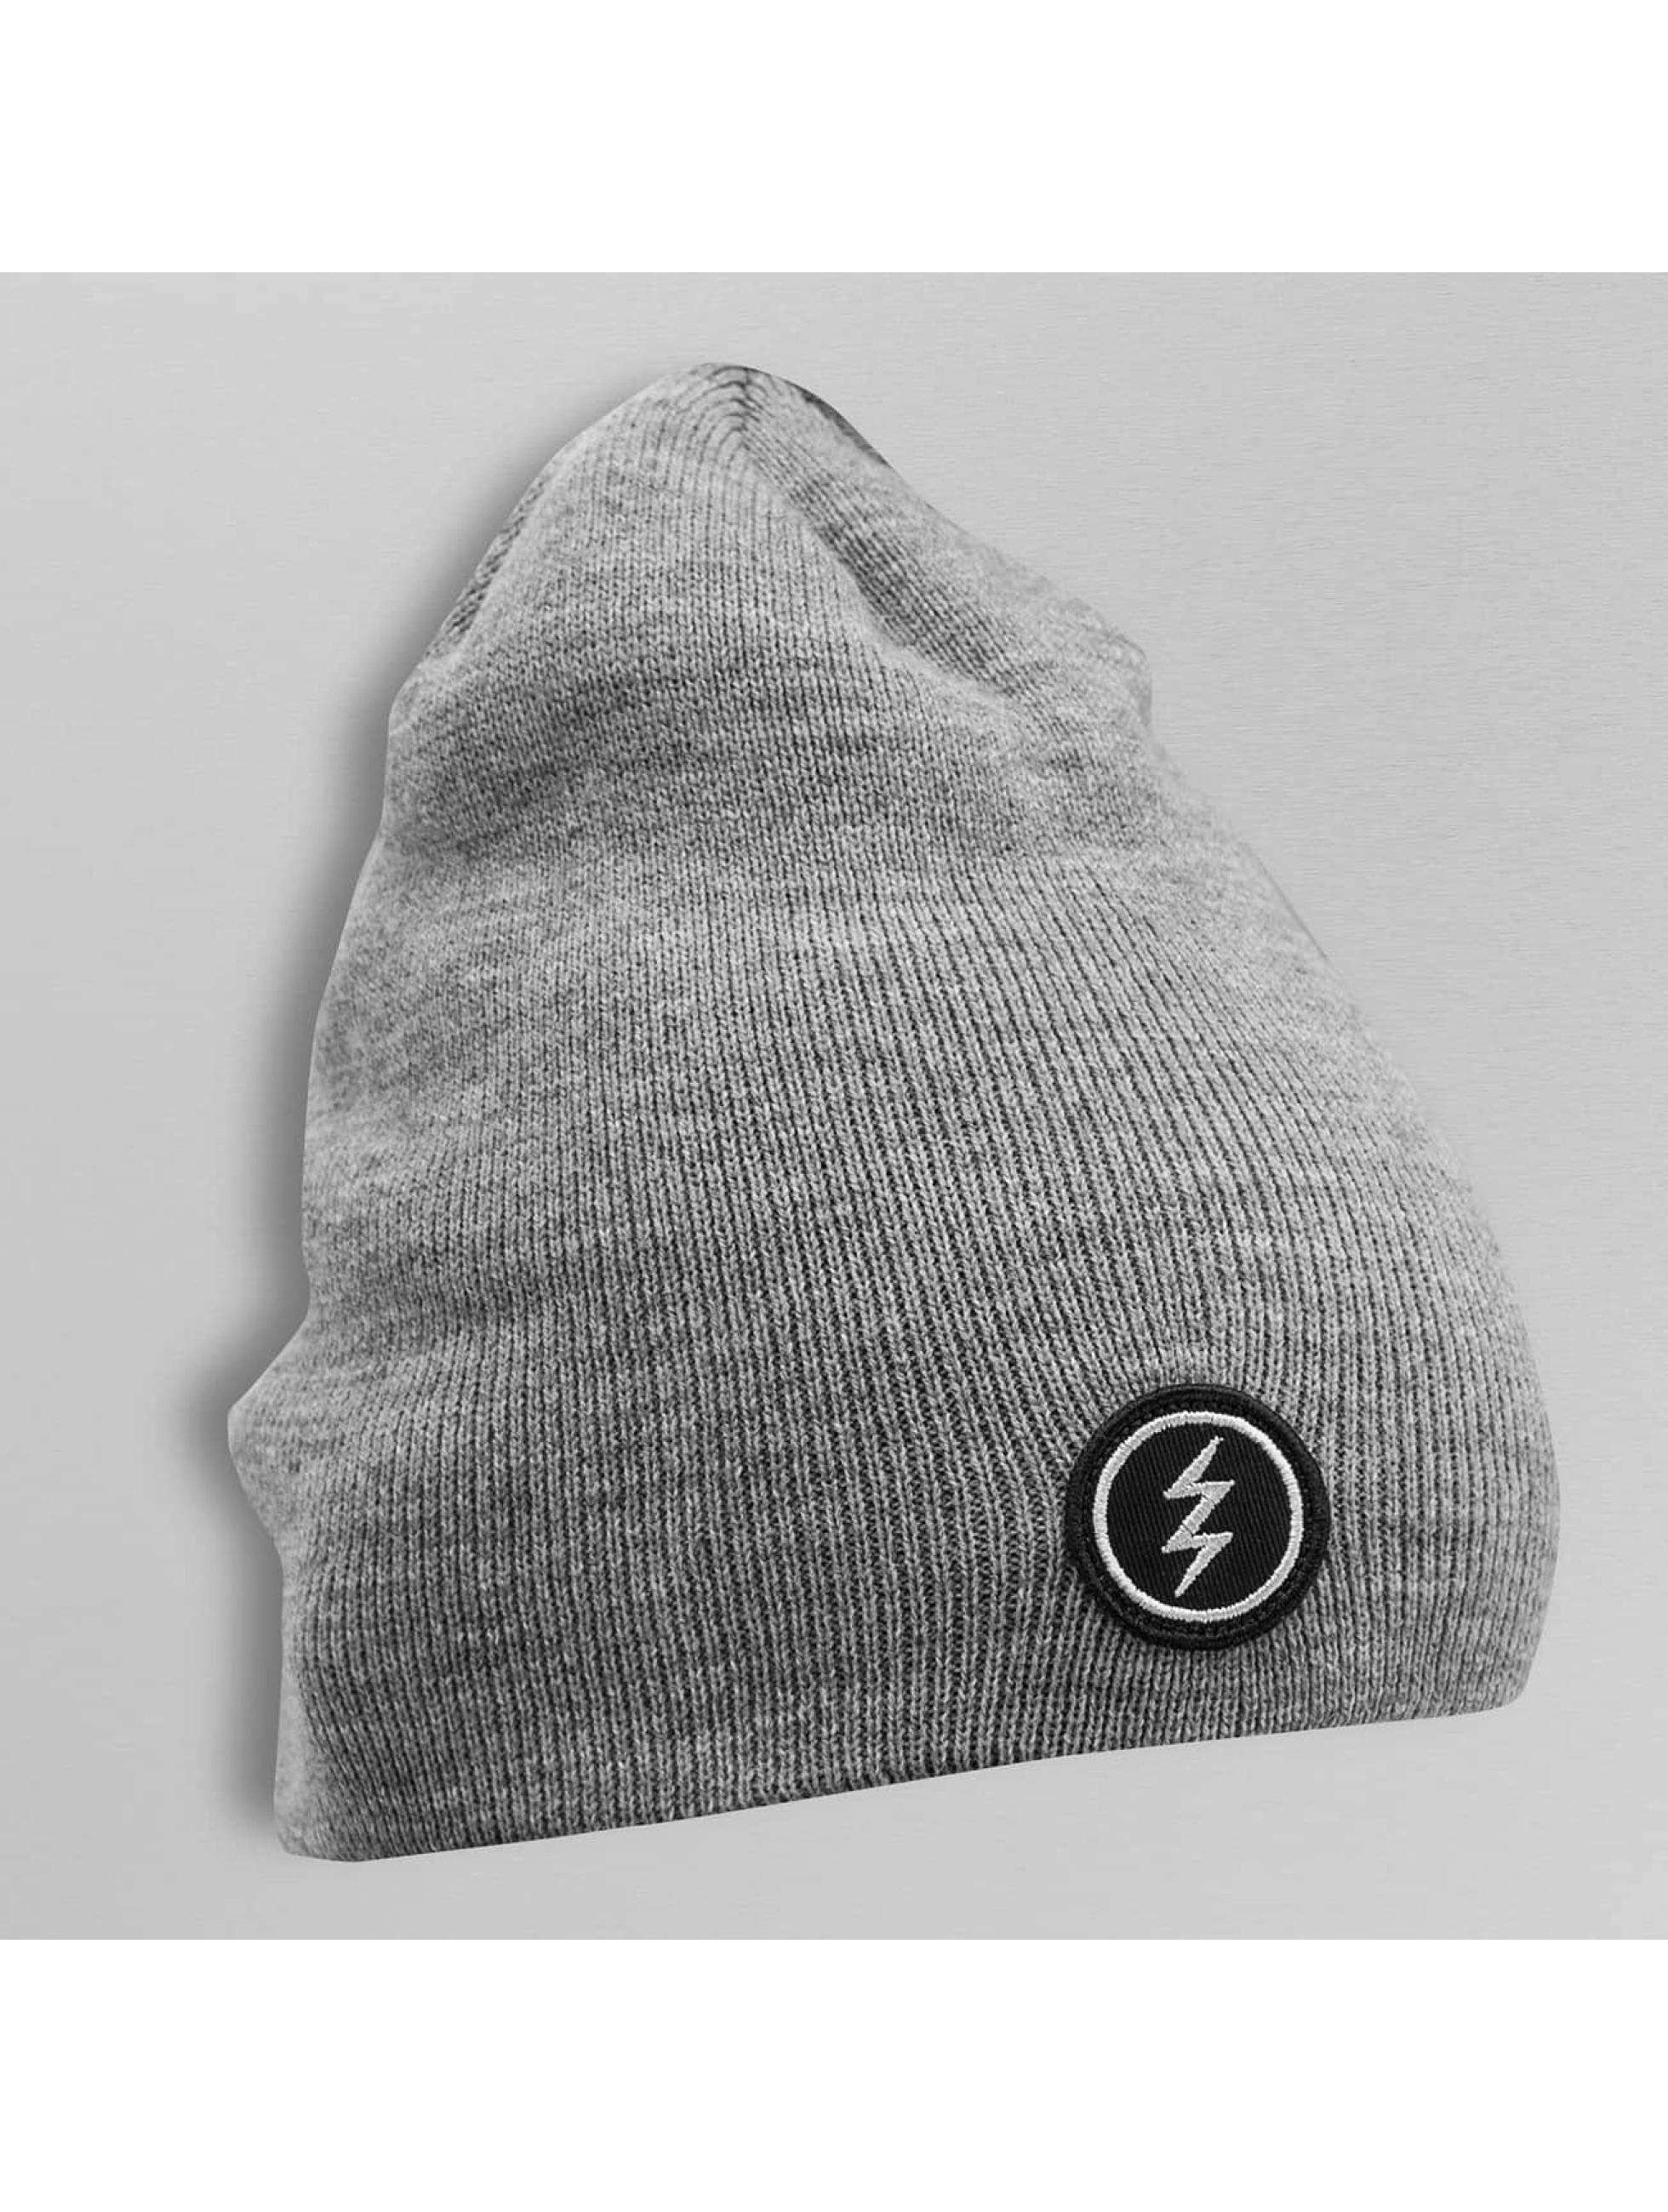 Electric шляпа CO. серый